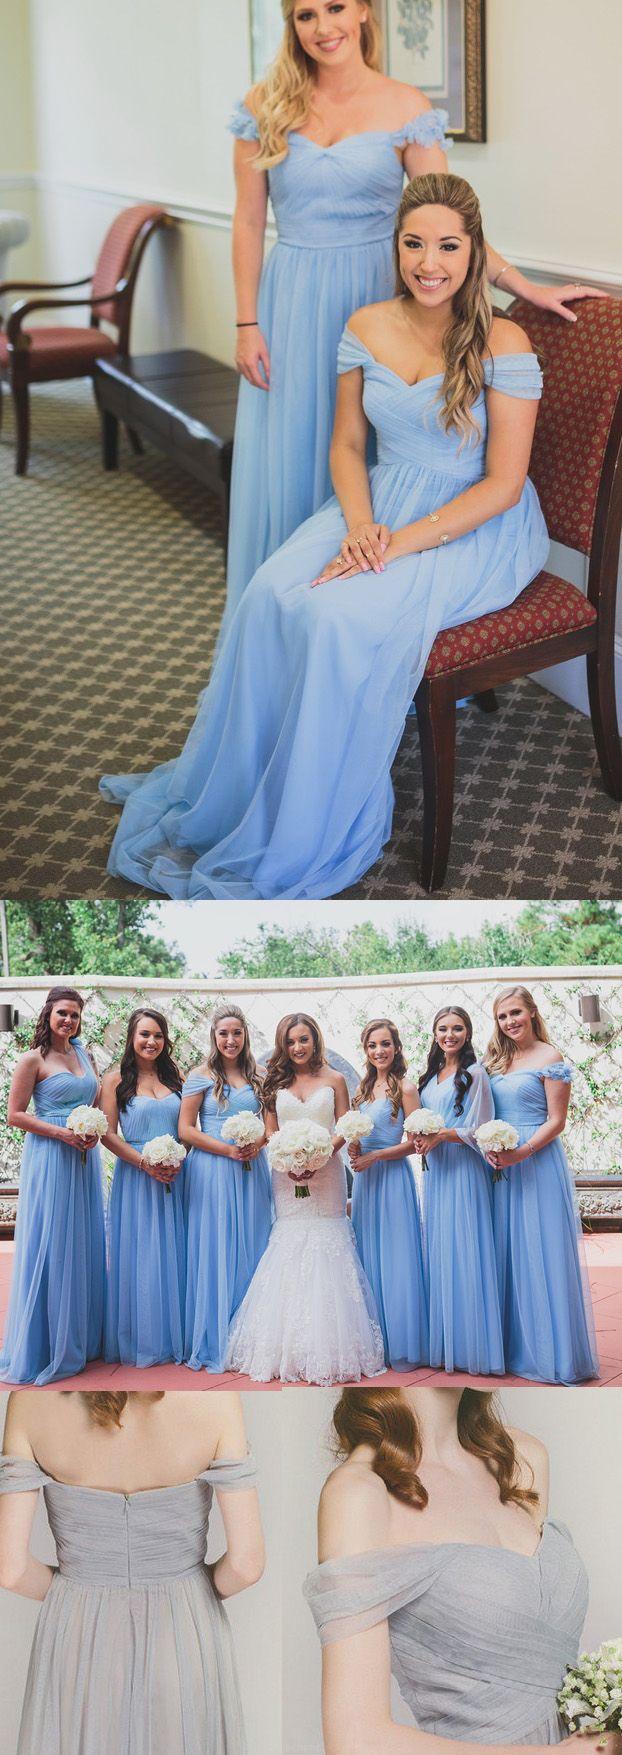 Bridesmaid Dresses Blue, Bridesmaid Dresses Cheap, Cheap Bridesmaid Dresses, Long Chiffon Bridesmaid Dresses, Blue Bridesmaid Dresses, Chiffon Bridesmaid Dresses, Light Blue dresses, Long Bridesmaid Dresses, Light Blue Bridesmaid Dresses, Sleeveless Bridesmaid Dresses, Zipper Bridesmaid Dresses, Ruffles Bridesmaid Dresses